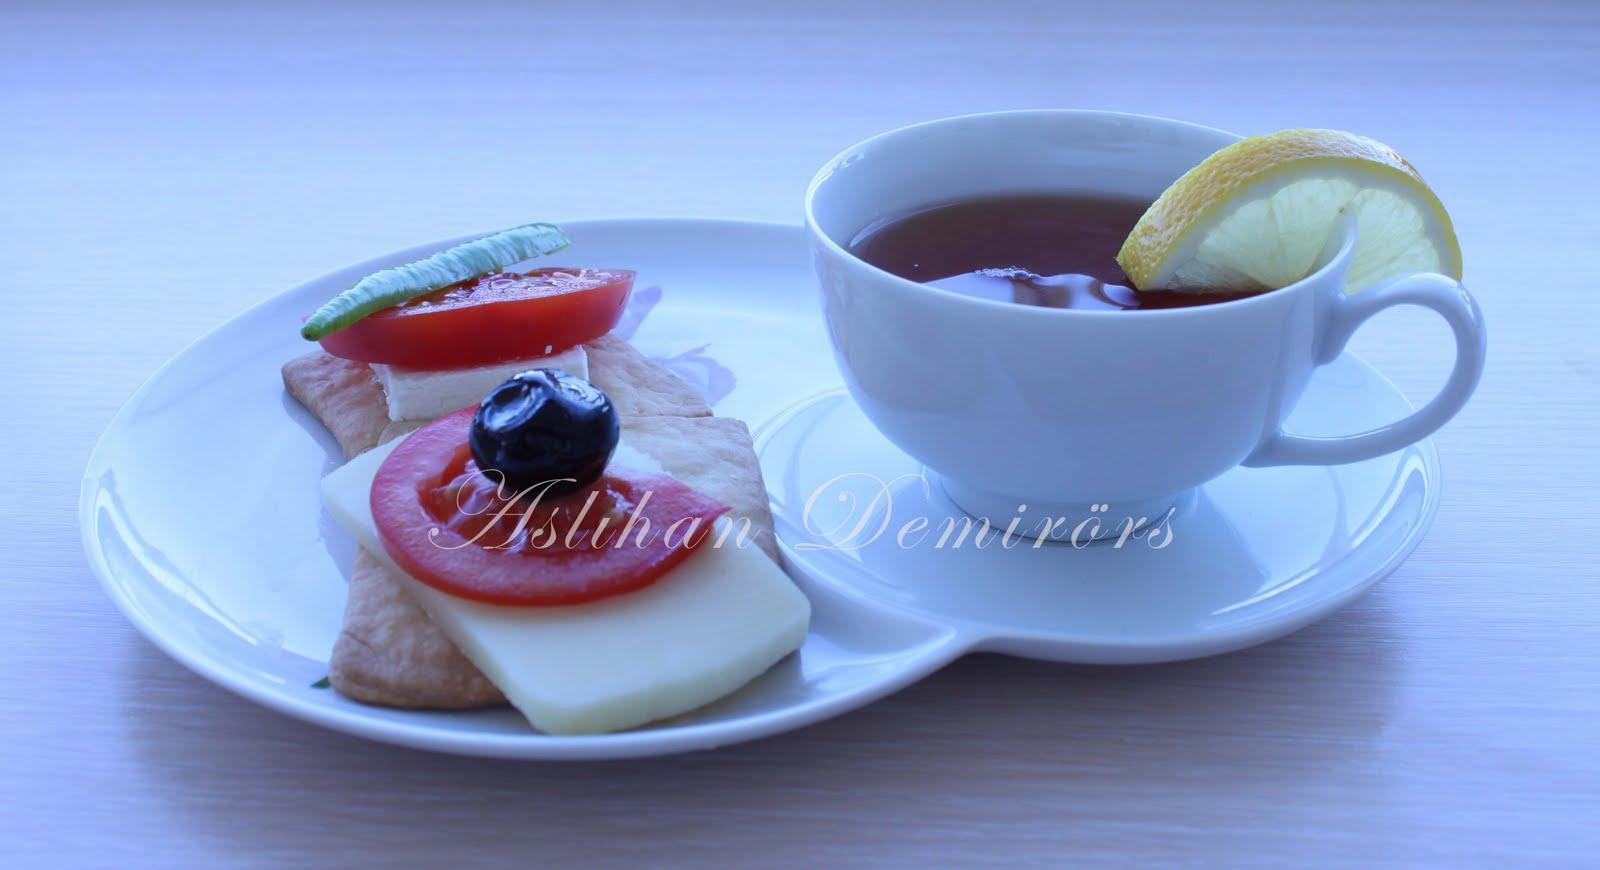 Diyet Mantarlı Tavuk Sote - 170 Kalori